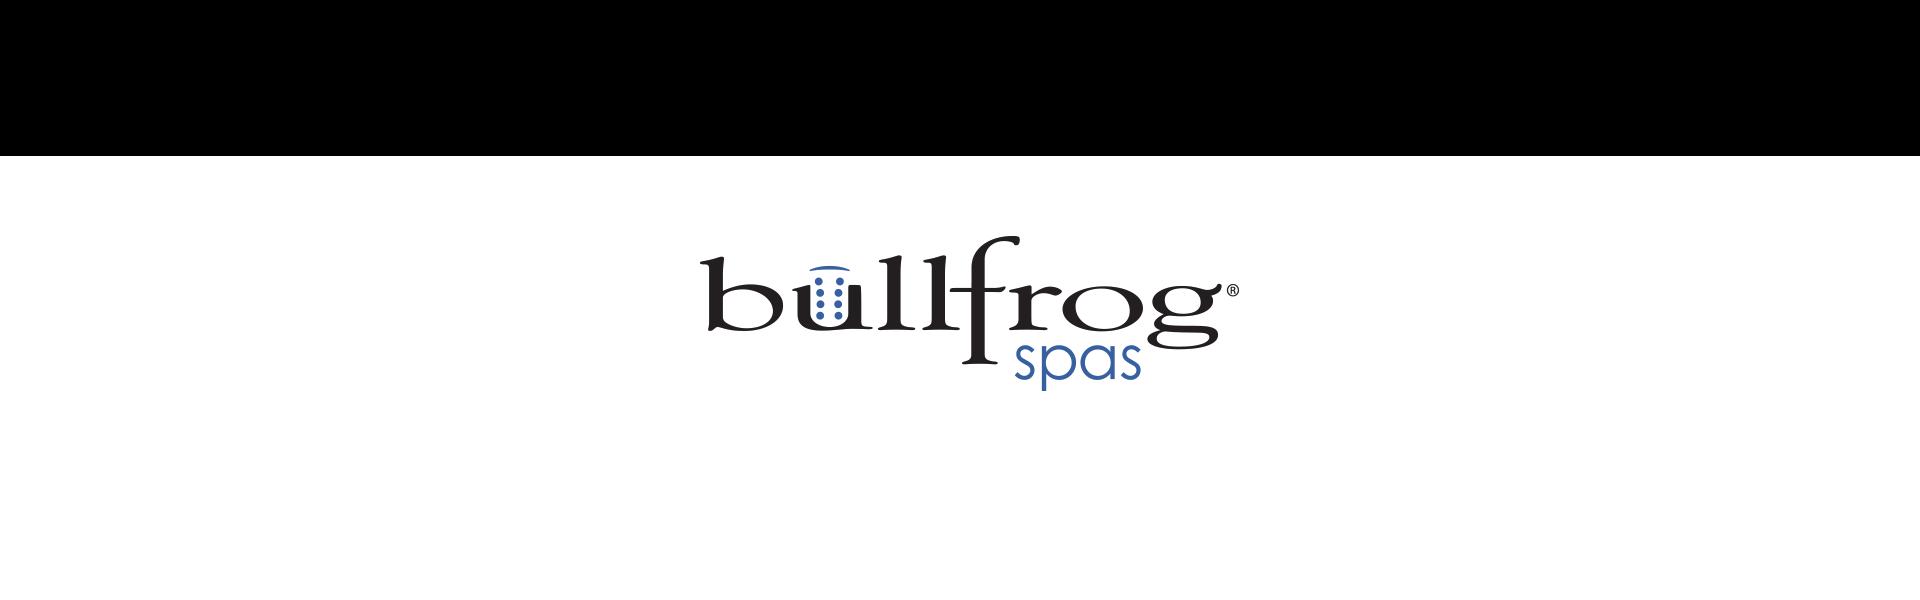 bullfrog-title-logo